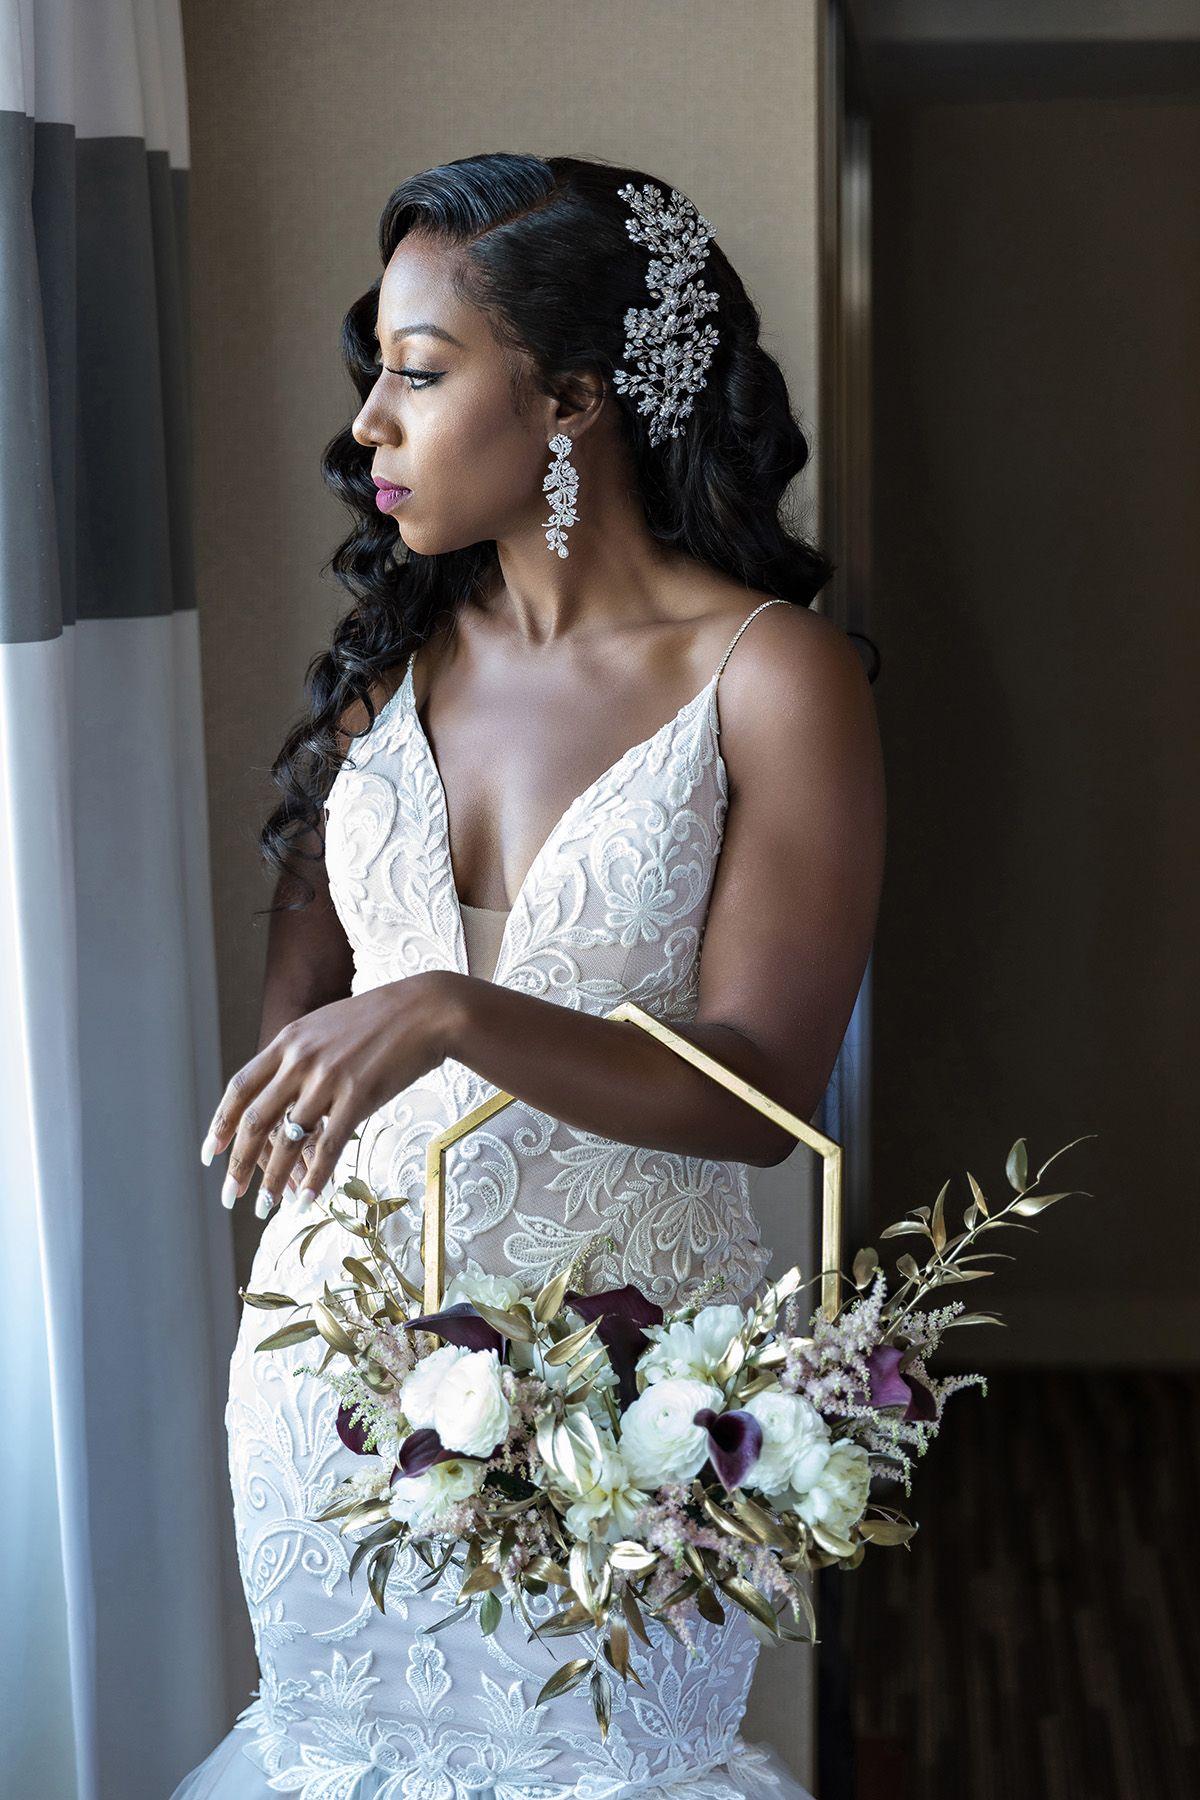 Pin By Wedding Chicks On Weddings In 2020 Munaluchi Bride Disney Wedding Dresses Bride